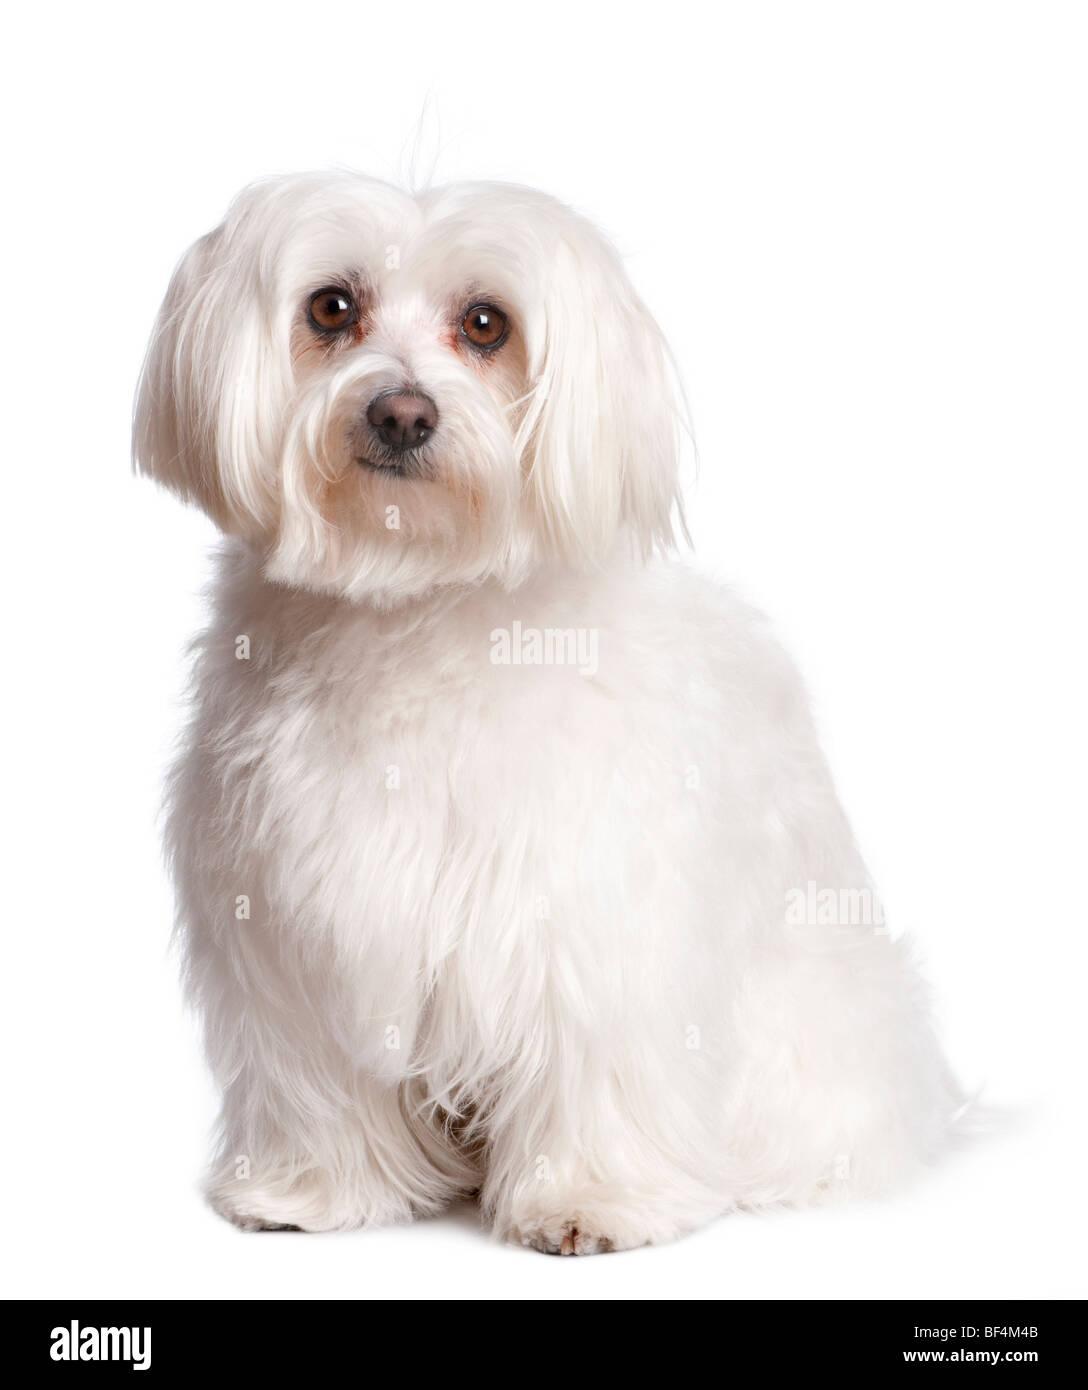 Portrait of maltese dog in front of white background, studio shot - Stock Image